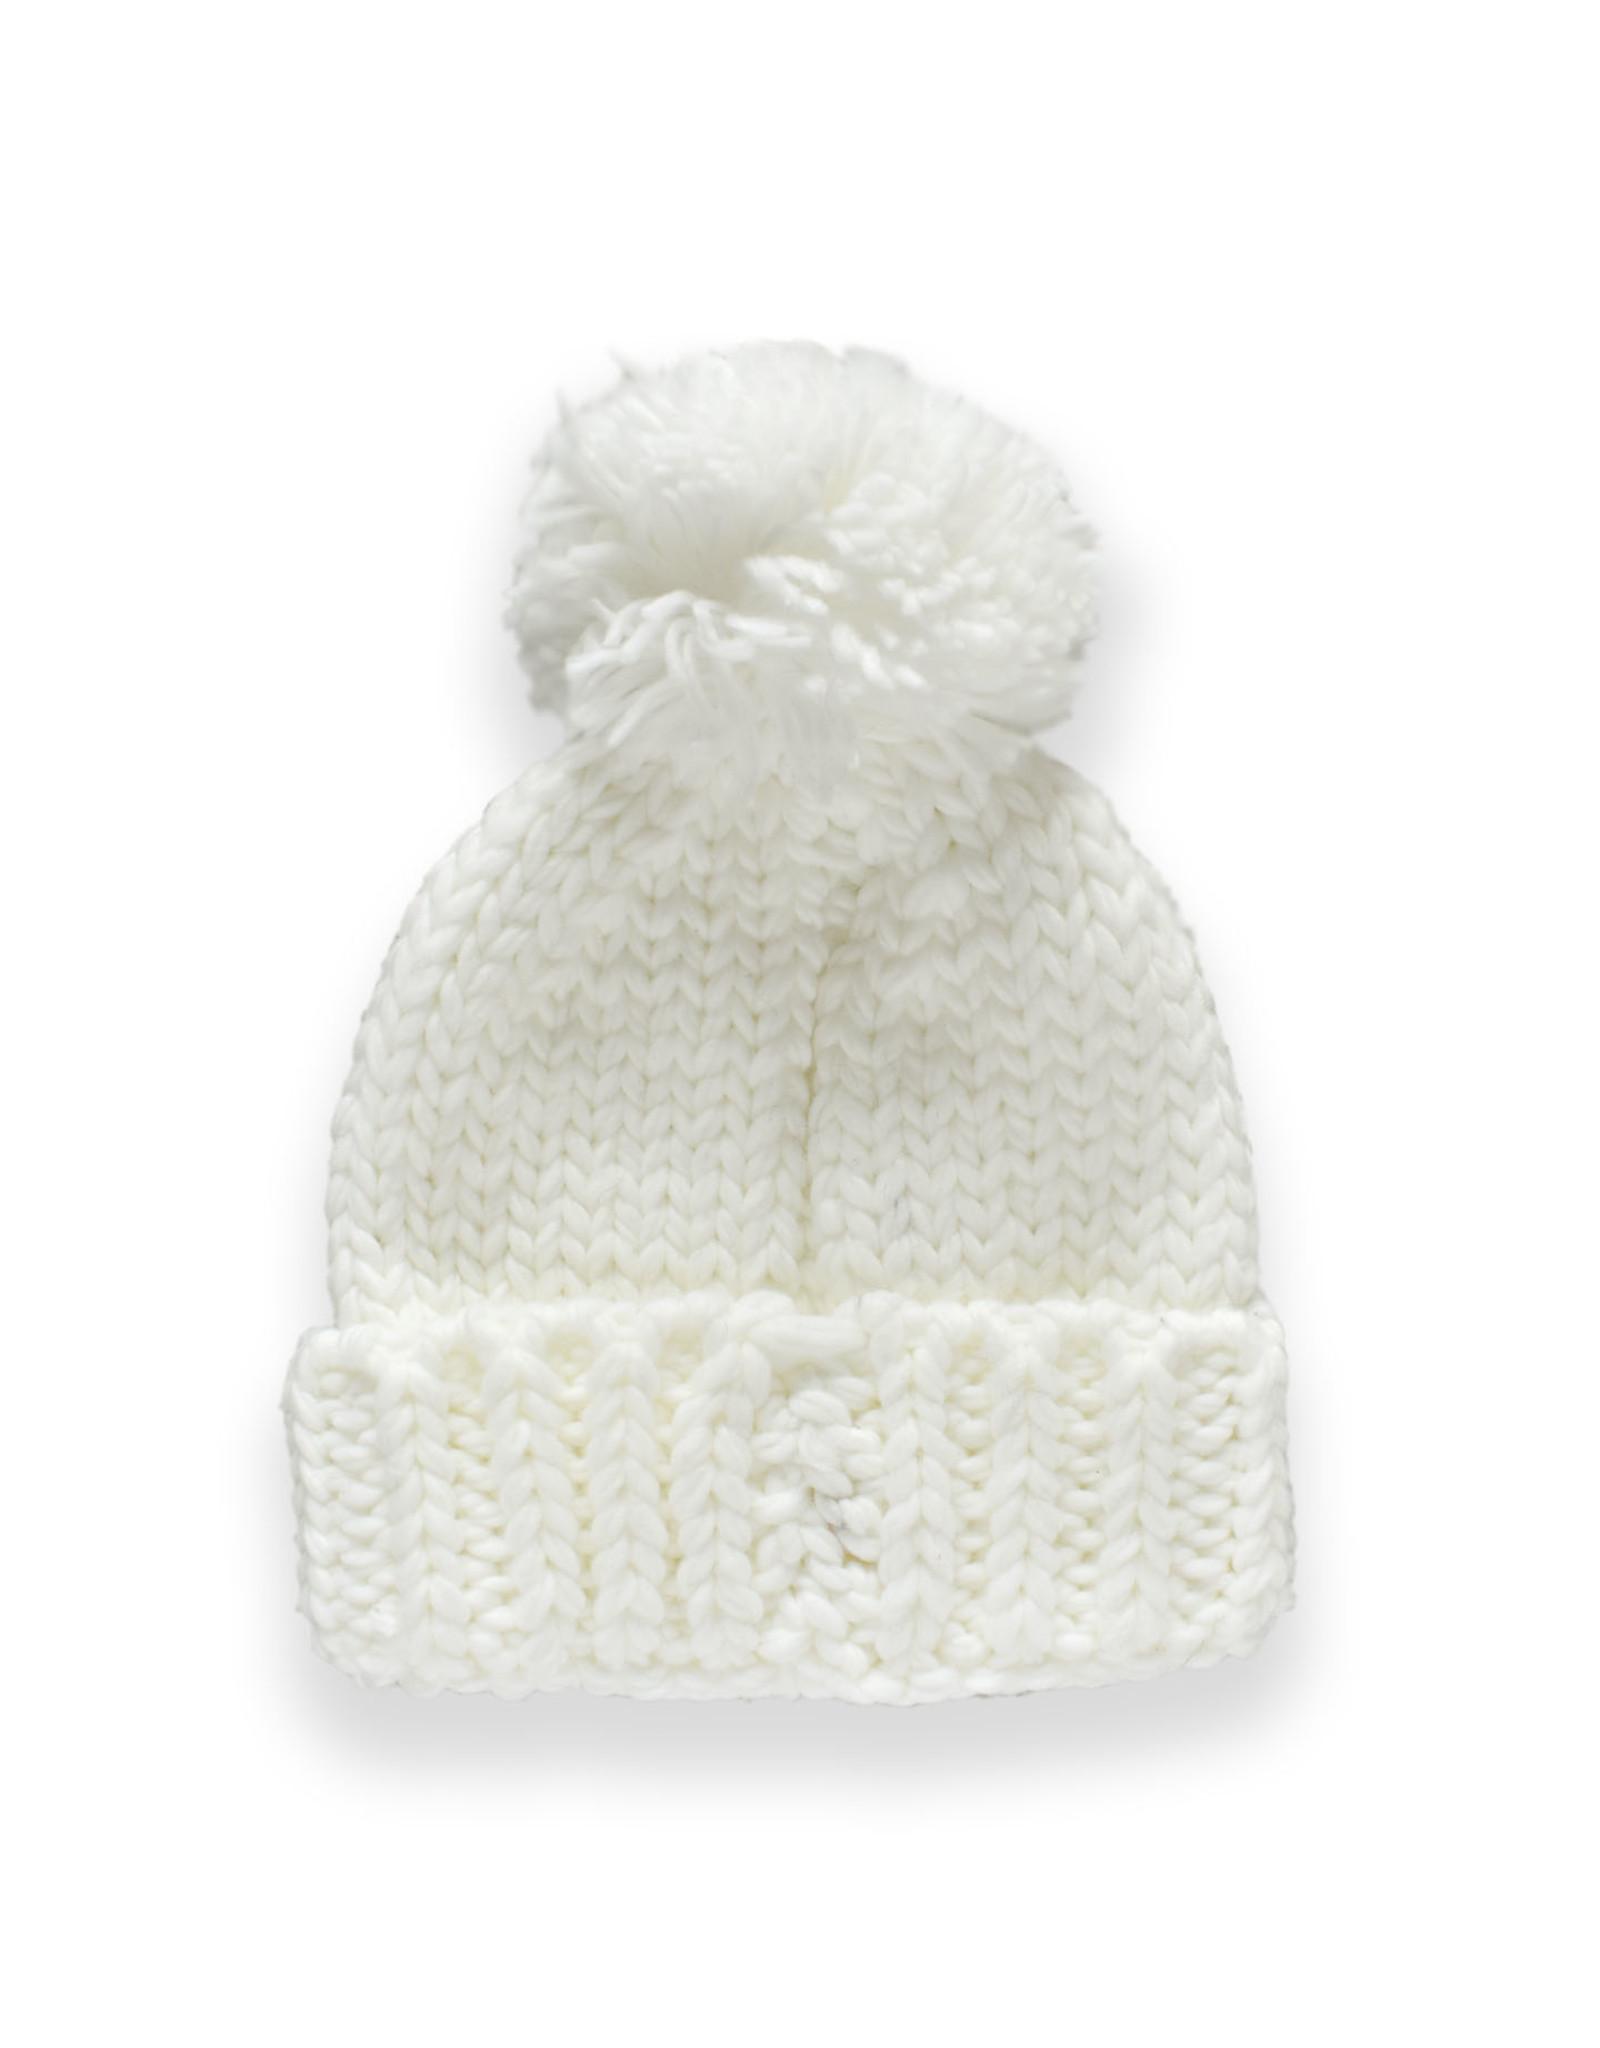 Thick Weave Pom Pom Hat - Ivory